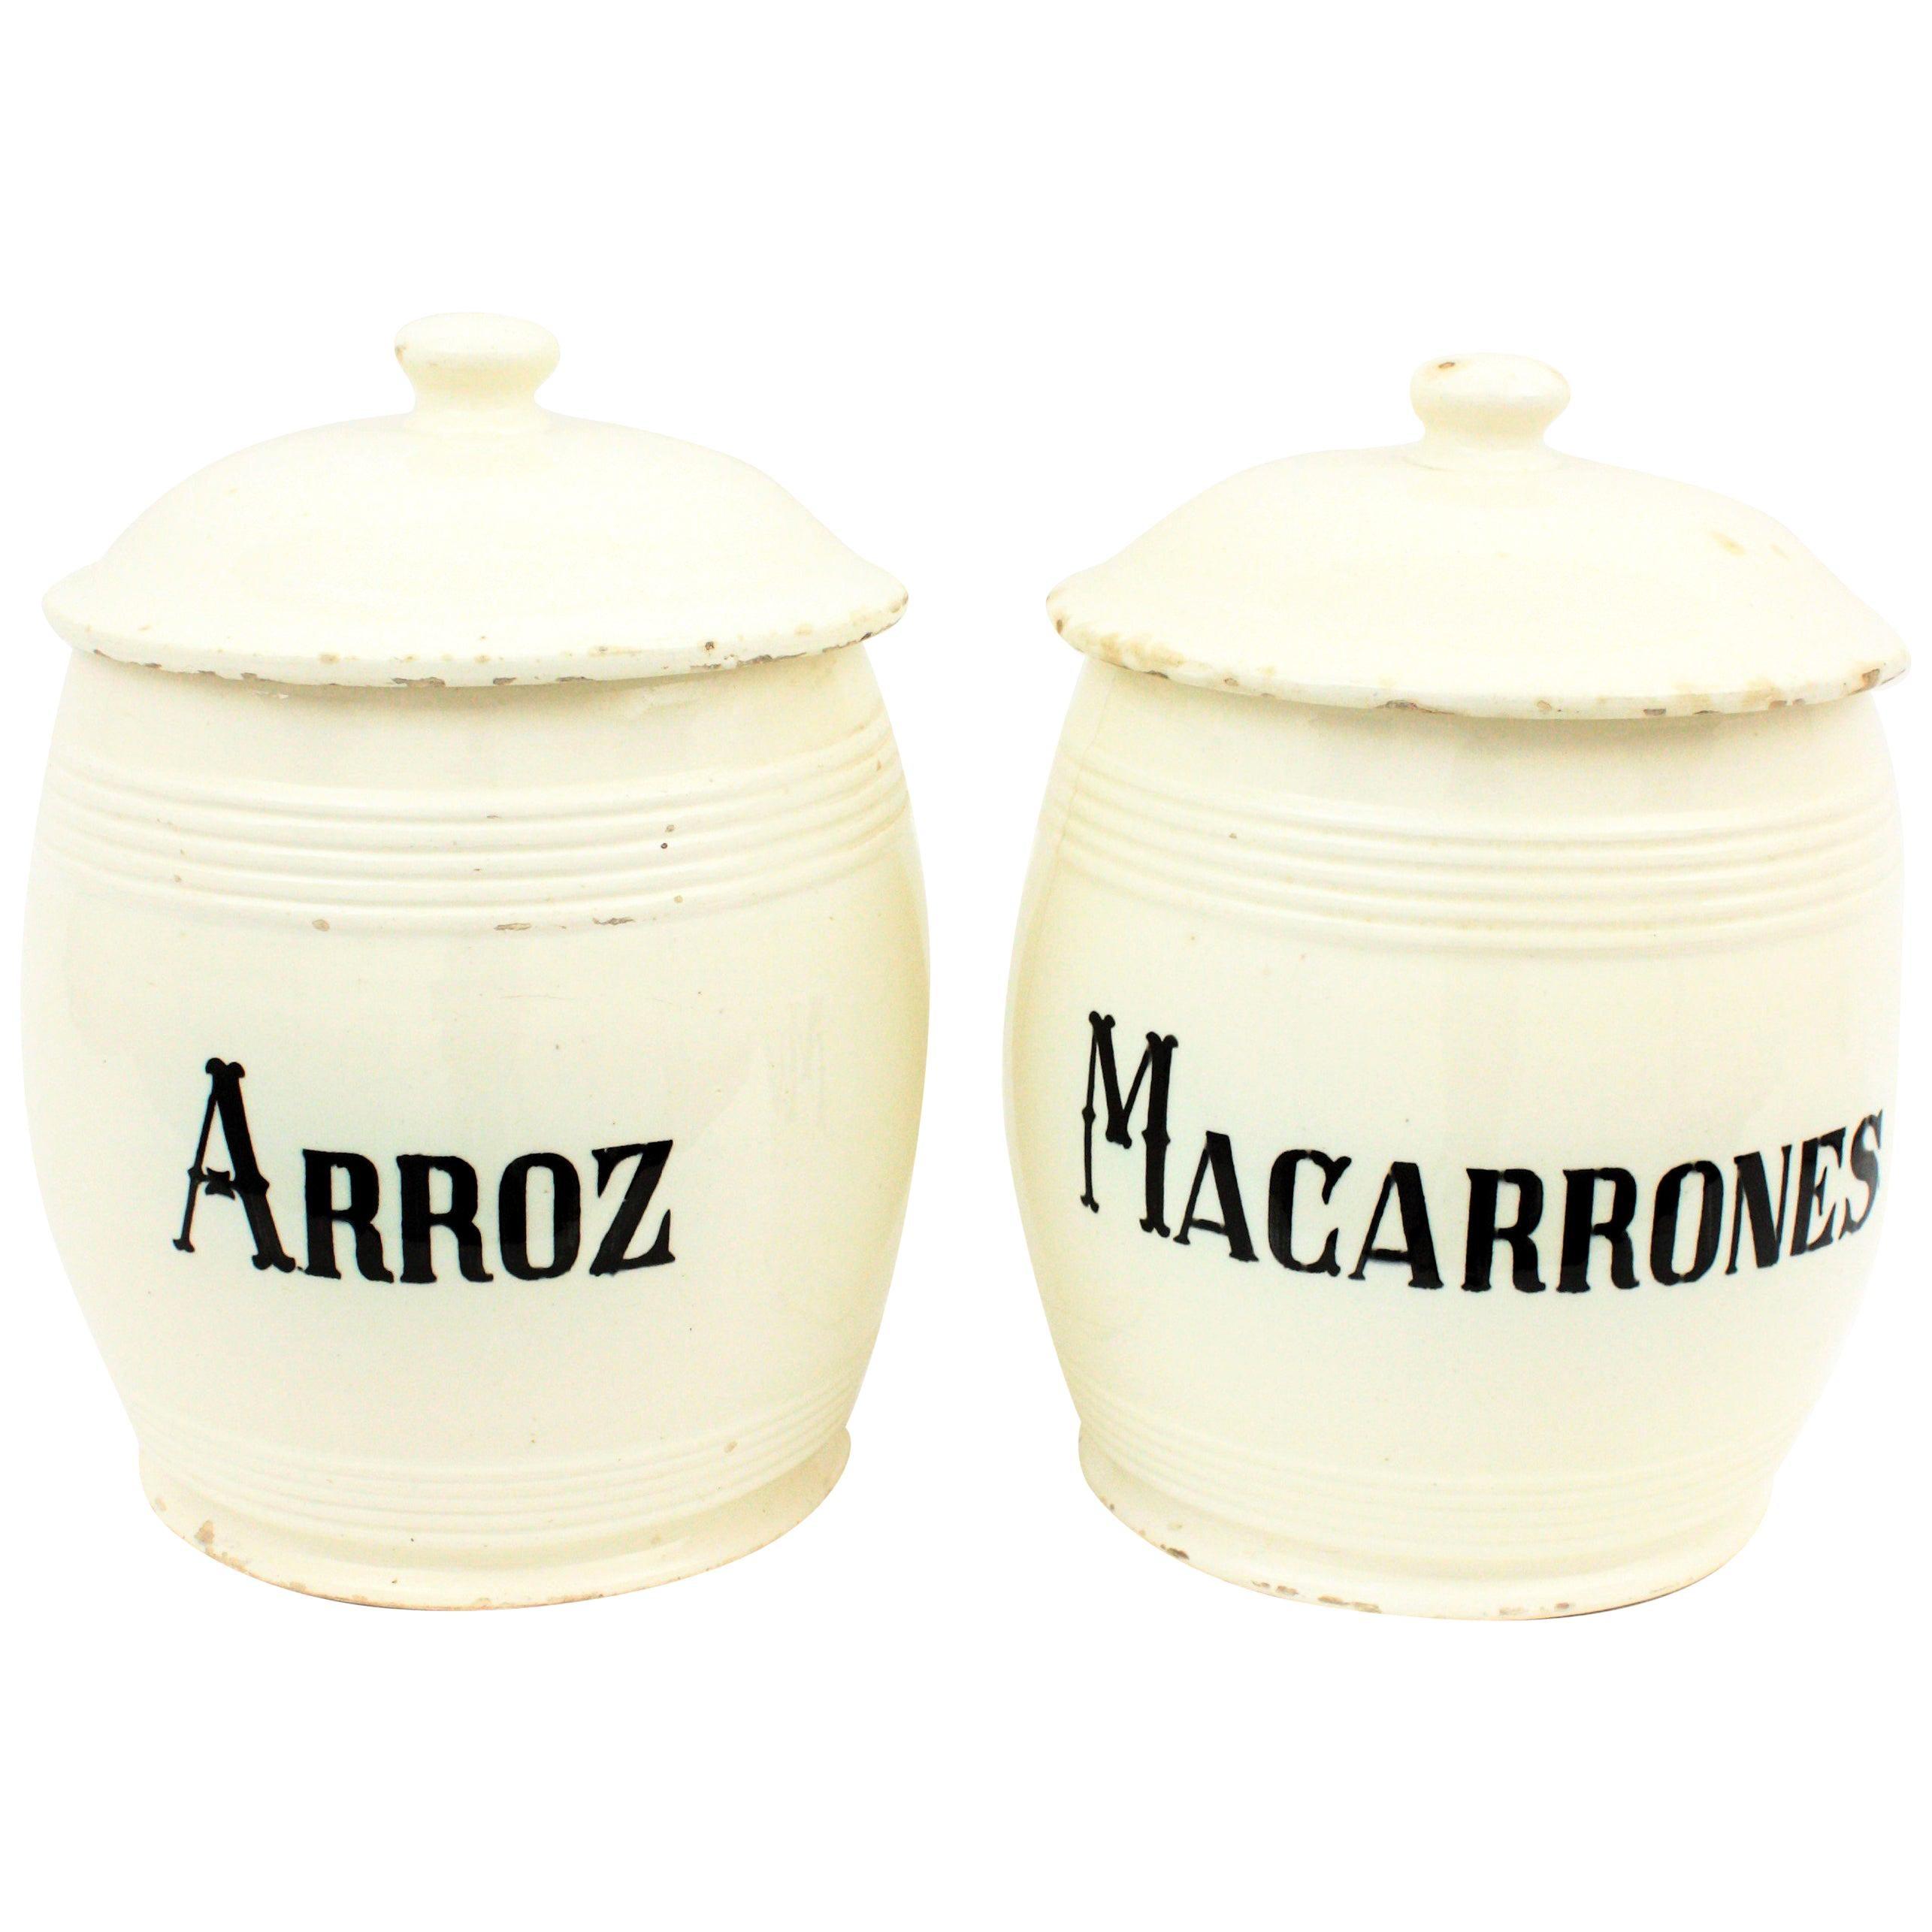 Spanish Glazed Ceramic Storage Jars / Kitchen Pottery Canisters